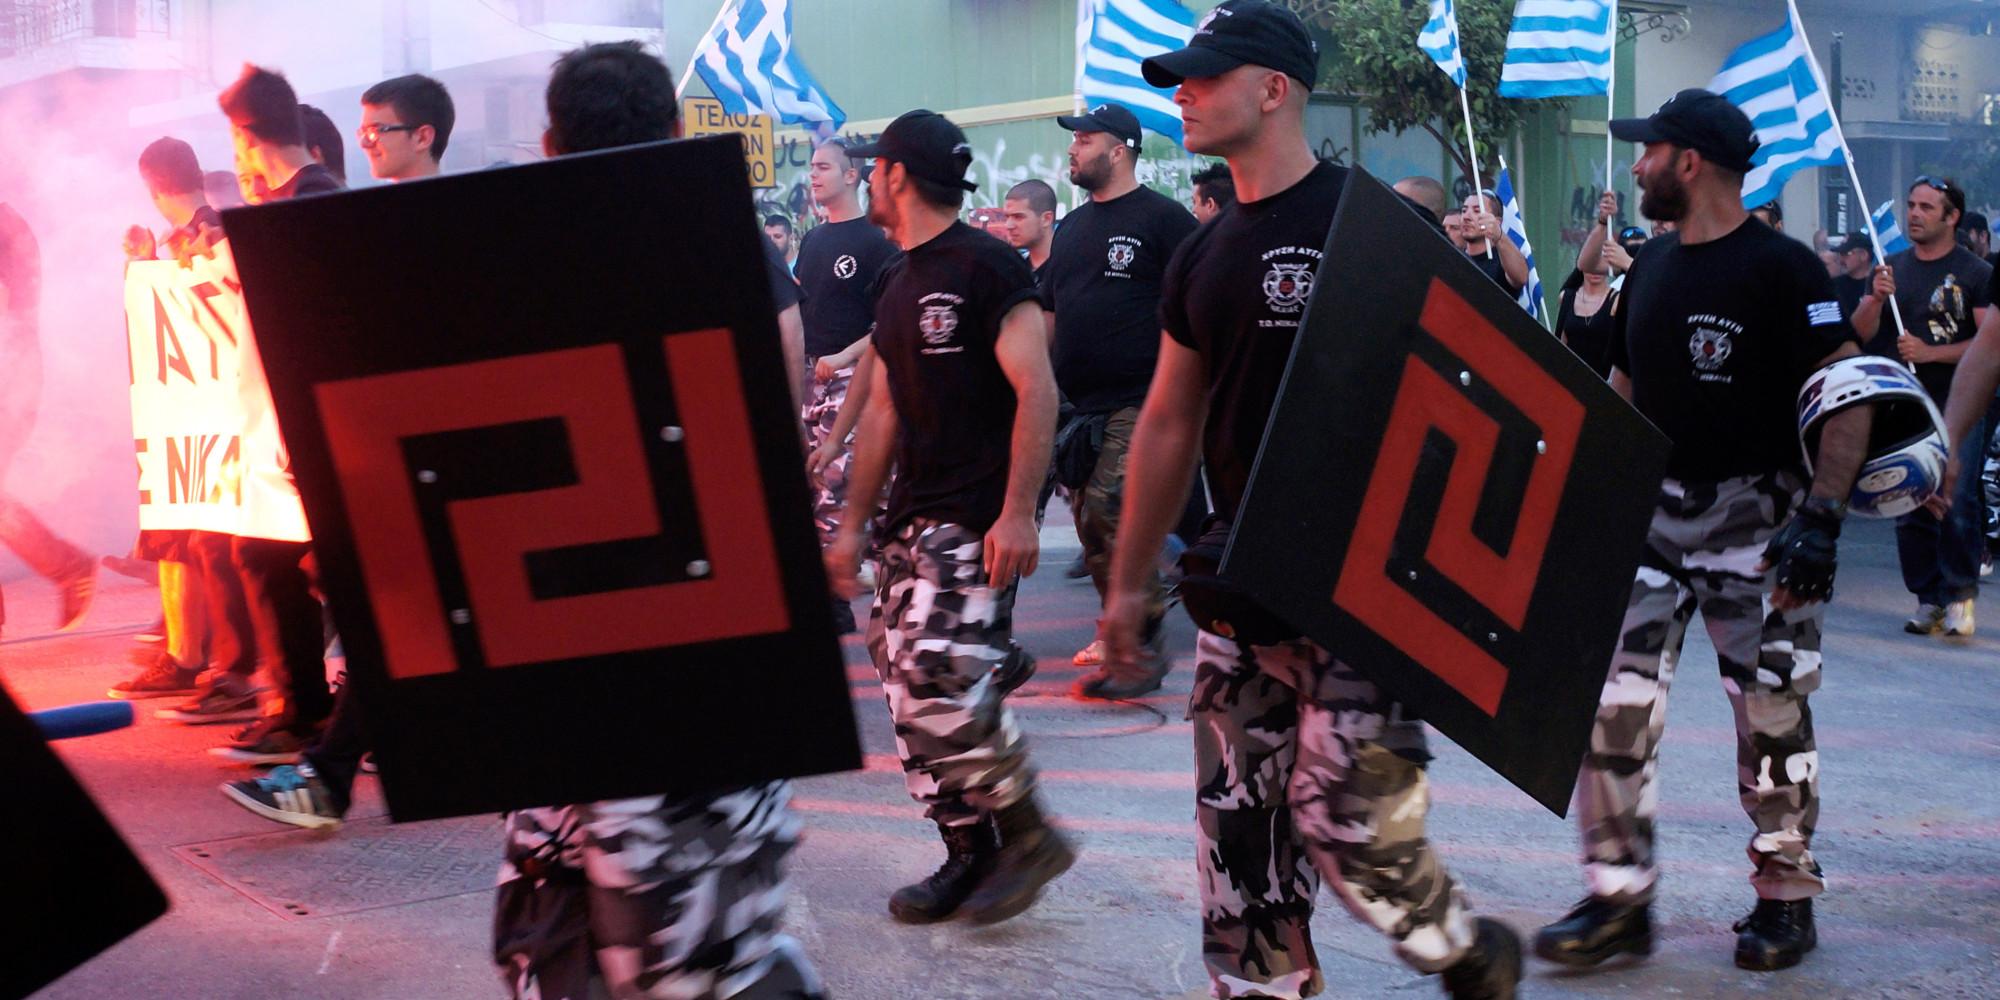 Brutal assault by members of Golden Dawn